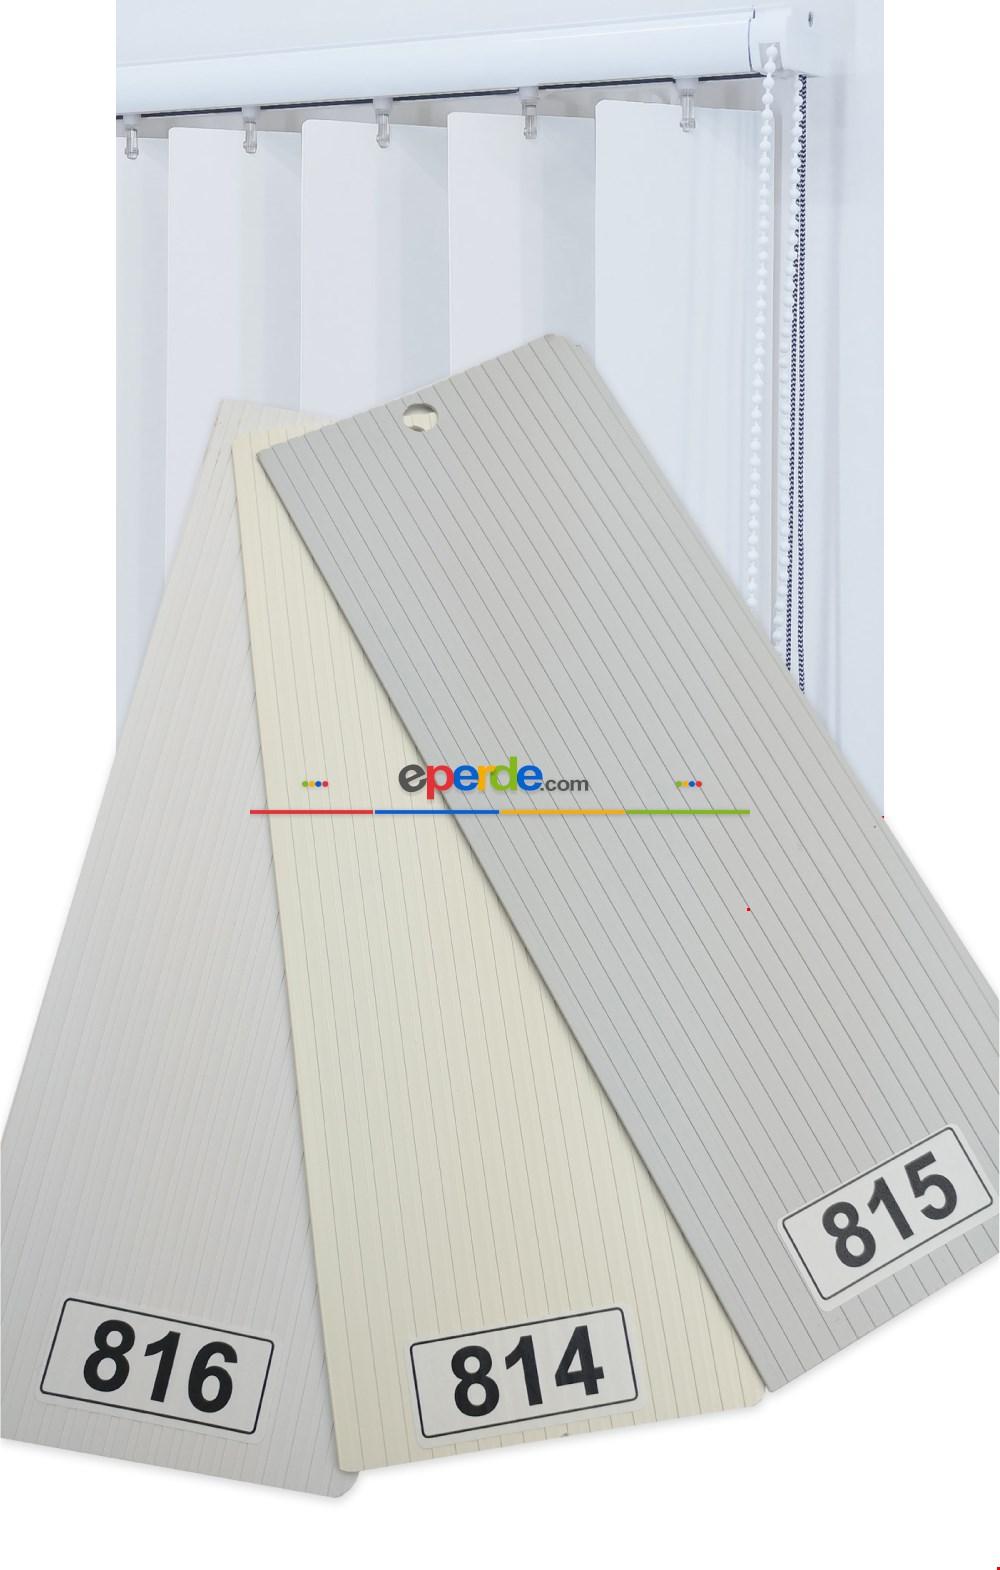 1. Kalite 3 Renk Çizgili Pvc Dikey Perde - Ofis Fabrika İşyeri Perdesi